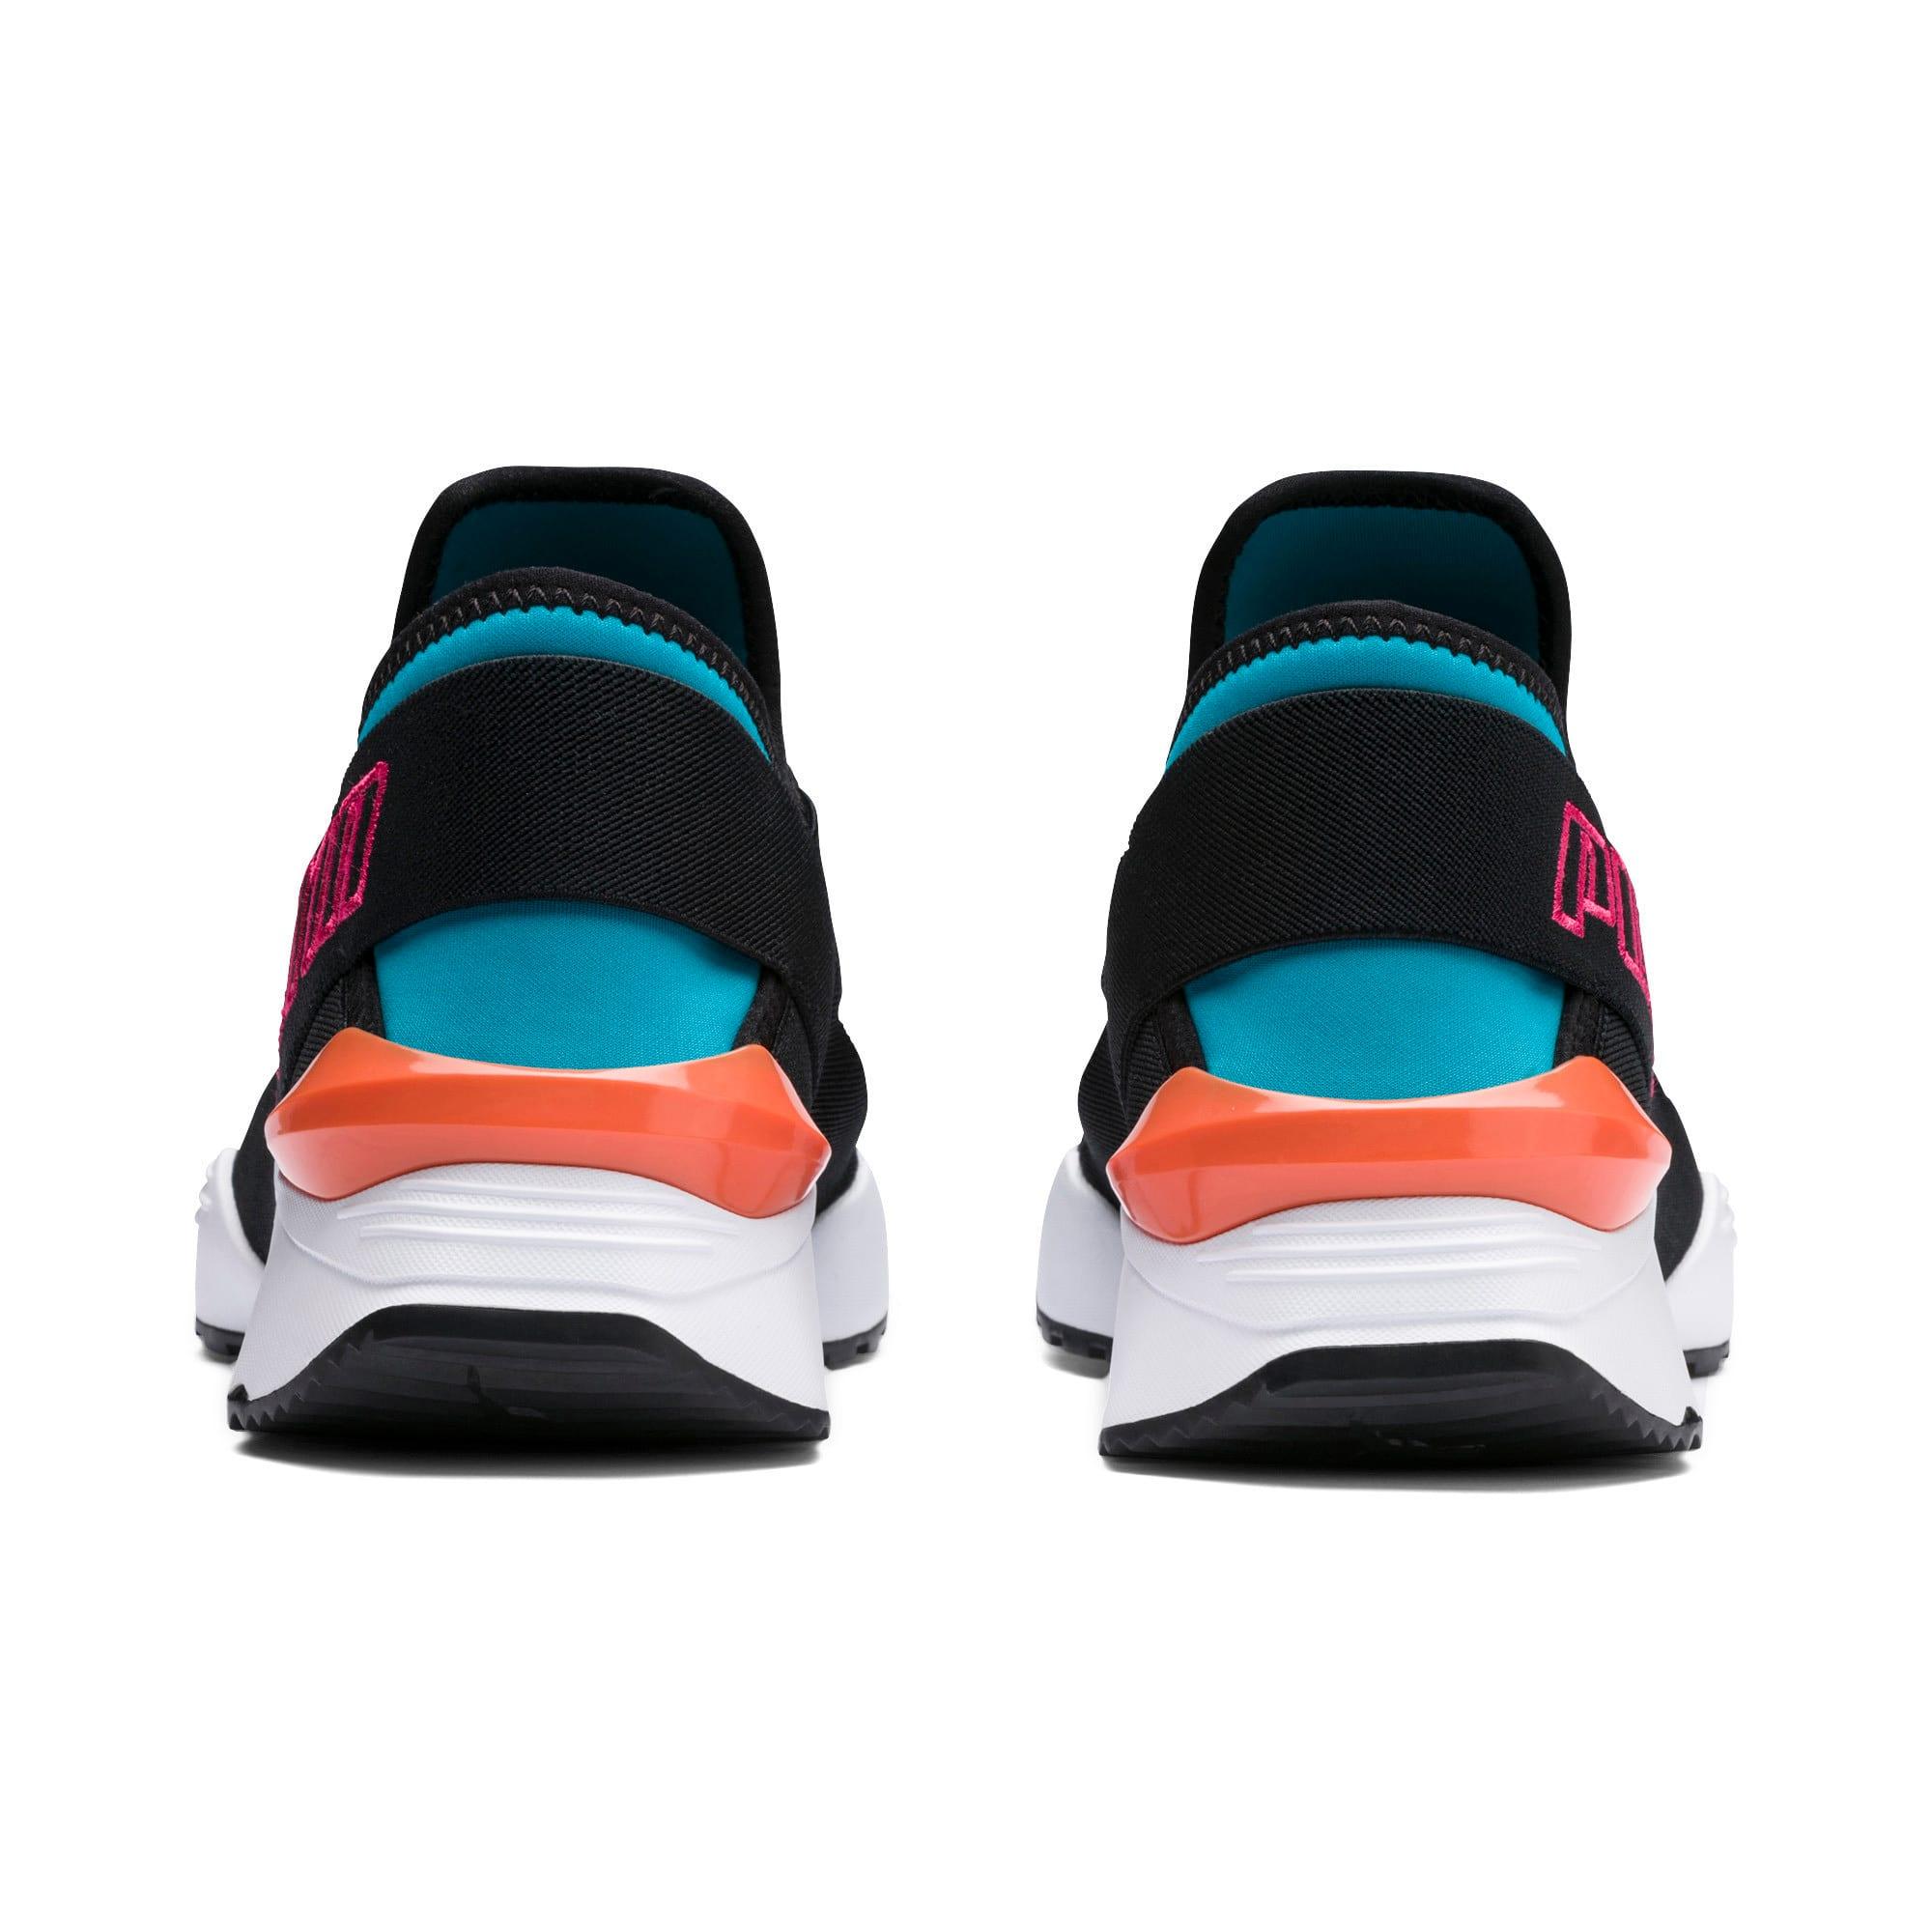 Thumbnail 4 of Muse 2 EOS Trailblazer Women's Sneakers, Caribbean Sea-Puma Black, medium